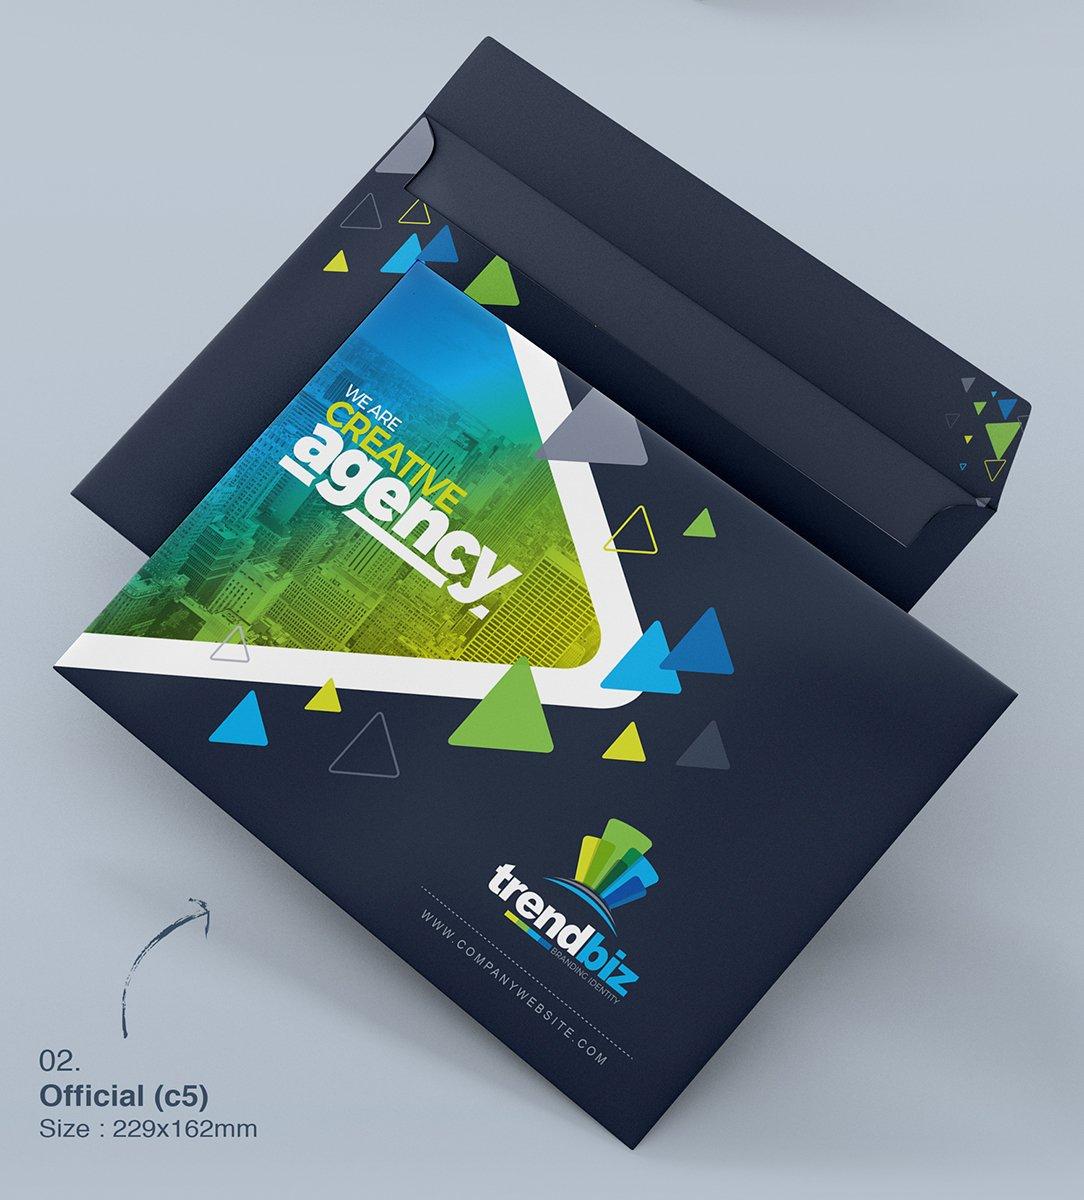 Stationery Branding Identity Bundle - $39 - 10 Envelop Official Size C5